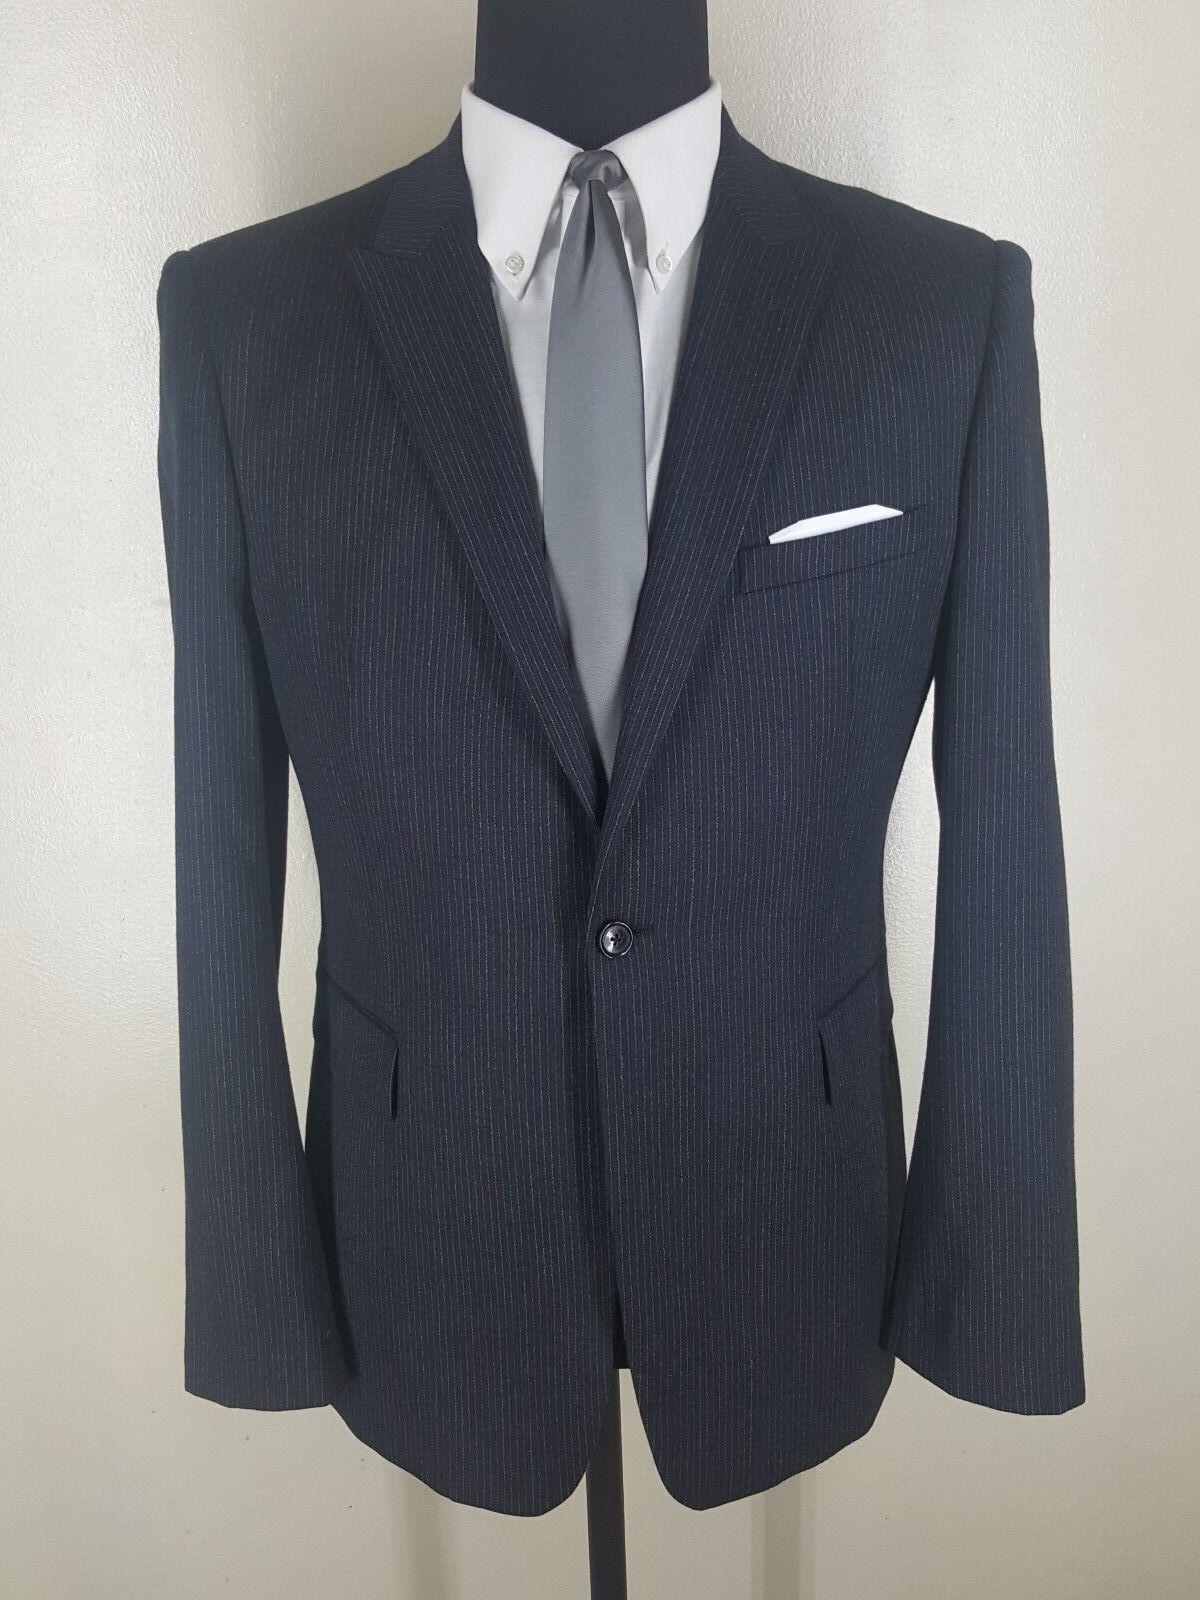 REISS Recent One Btn Peaked Lapel  Center Vent Striped Wool Sport Coat 42 Reg